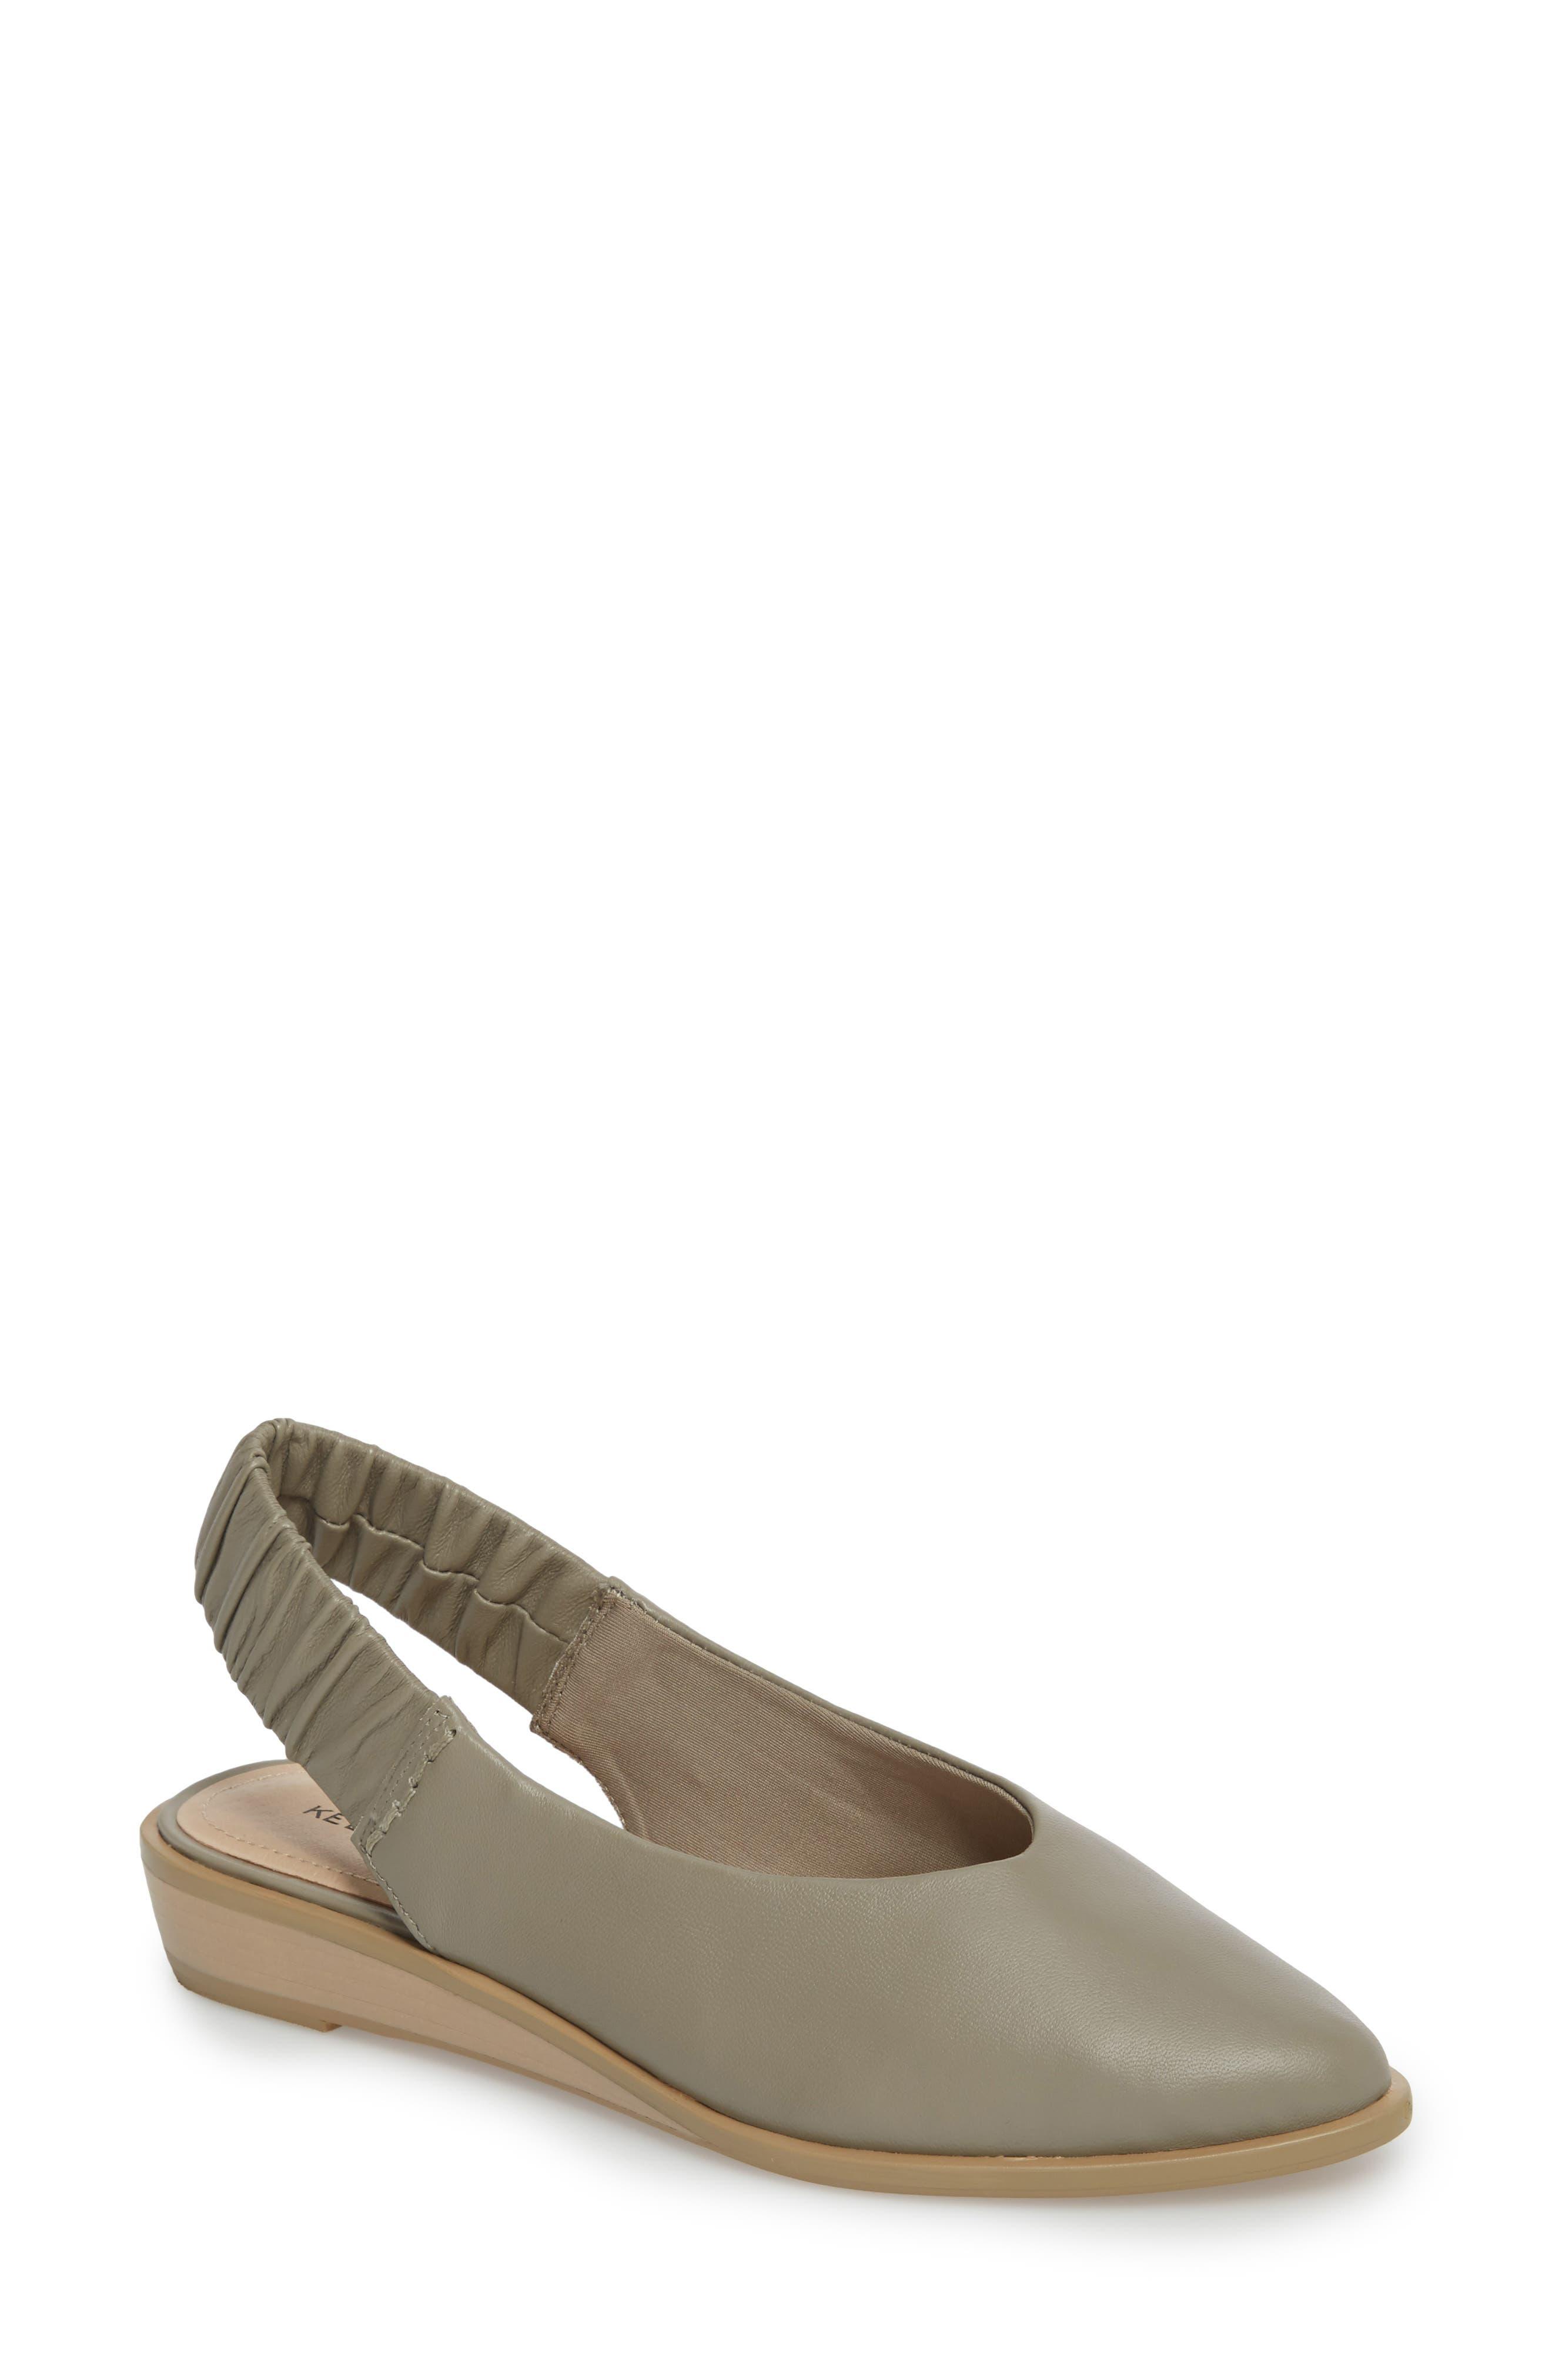 Alton Slingback Sandal,                         Main,                         color, Clove Leather